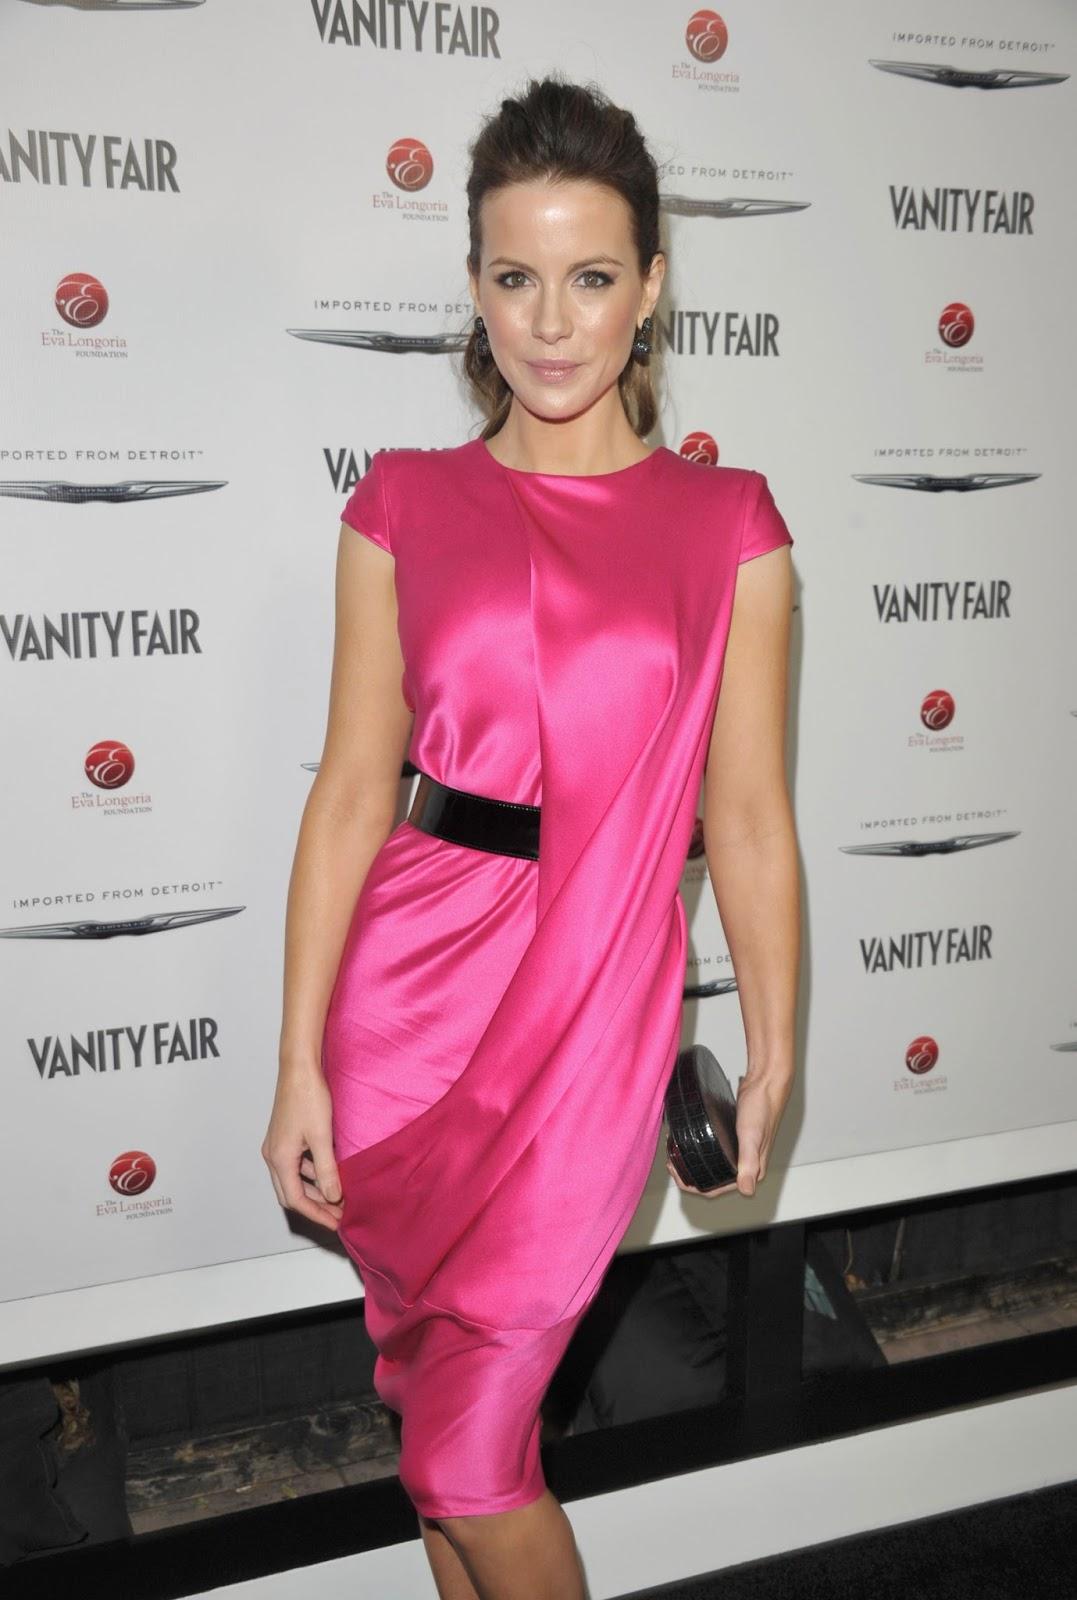 Full HD Wallpapers of Kate Beckinsale at VF Chrysler Celebration Of The Eva Longoria Foundation 8